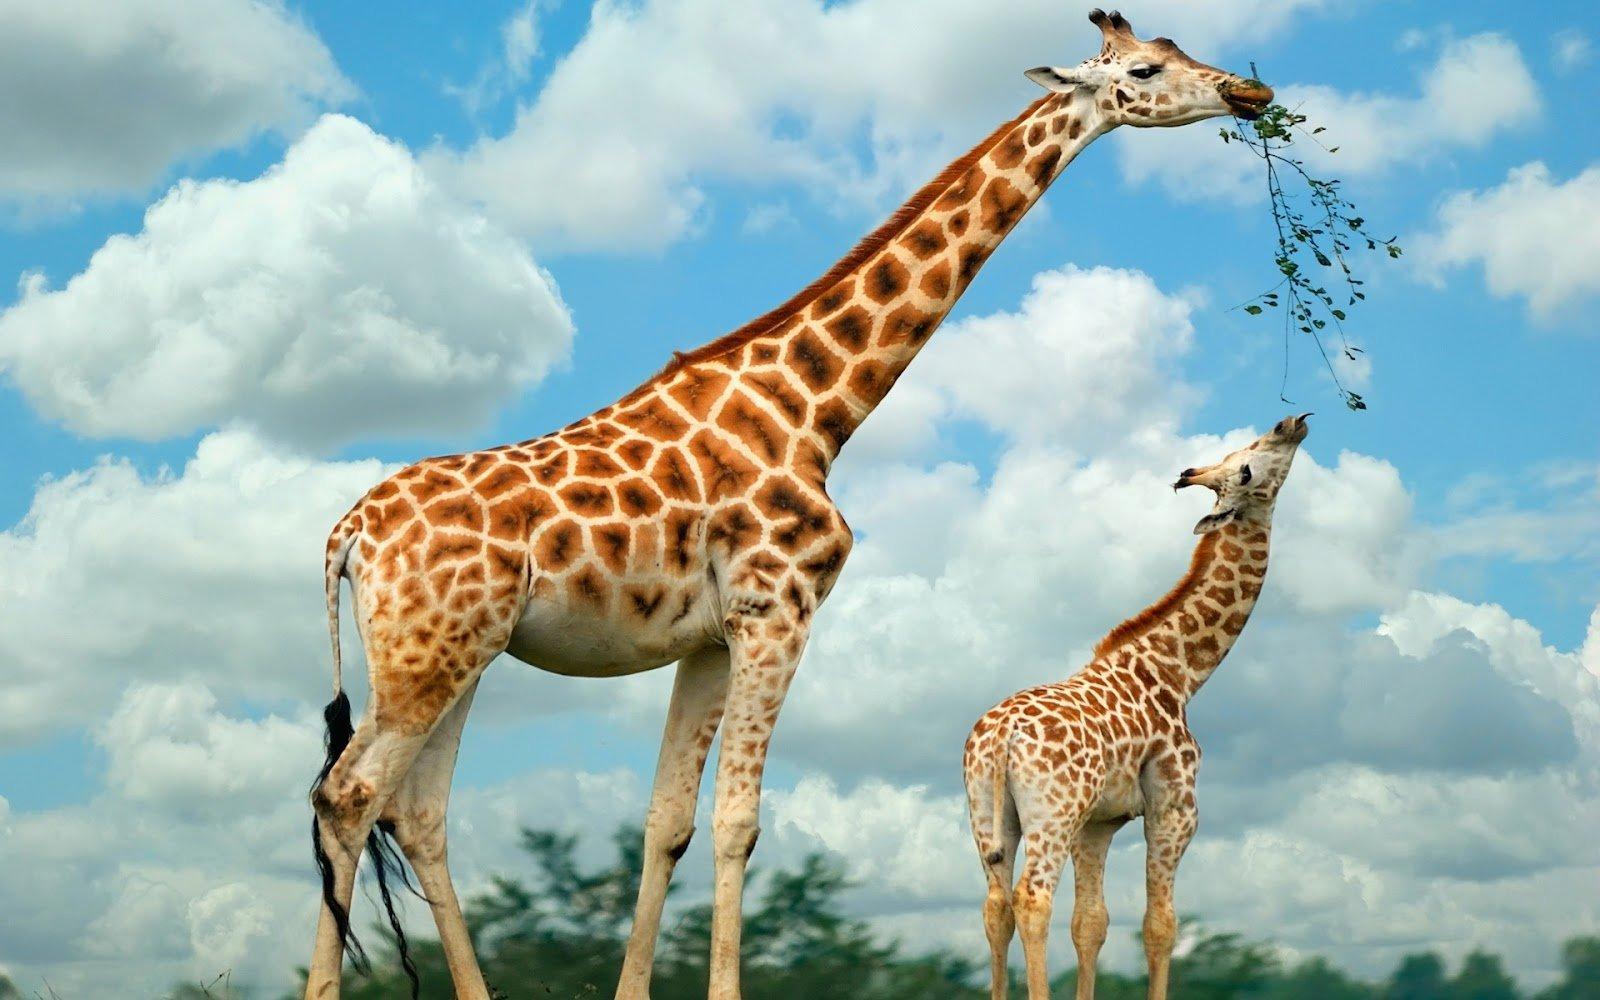 Giraffe Wallpapers HD Download